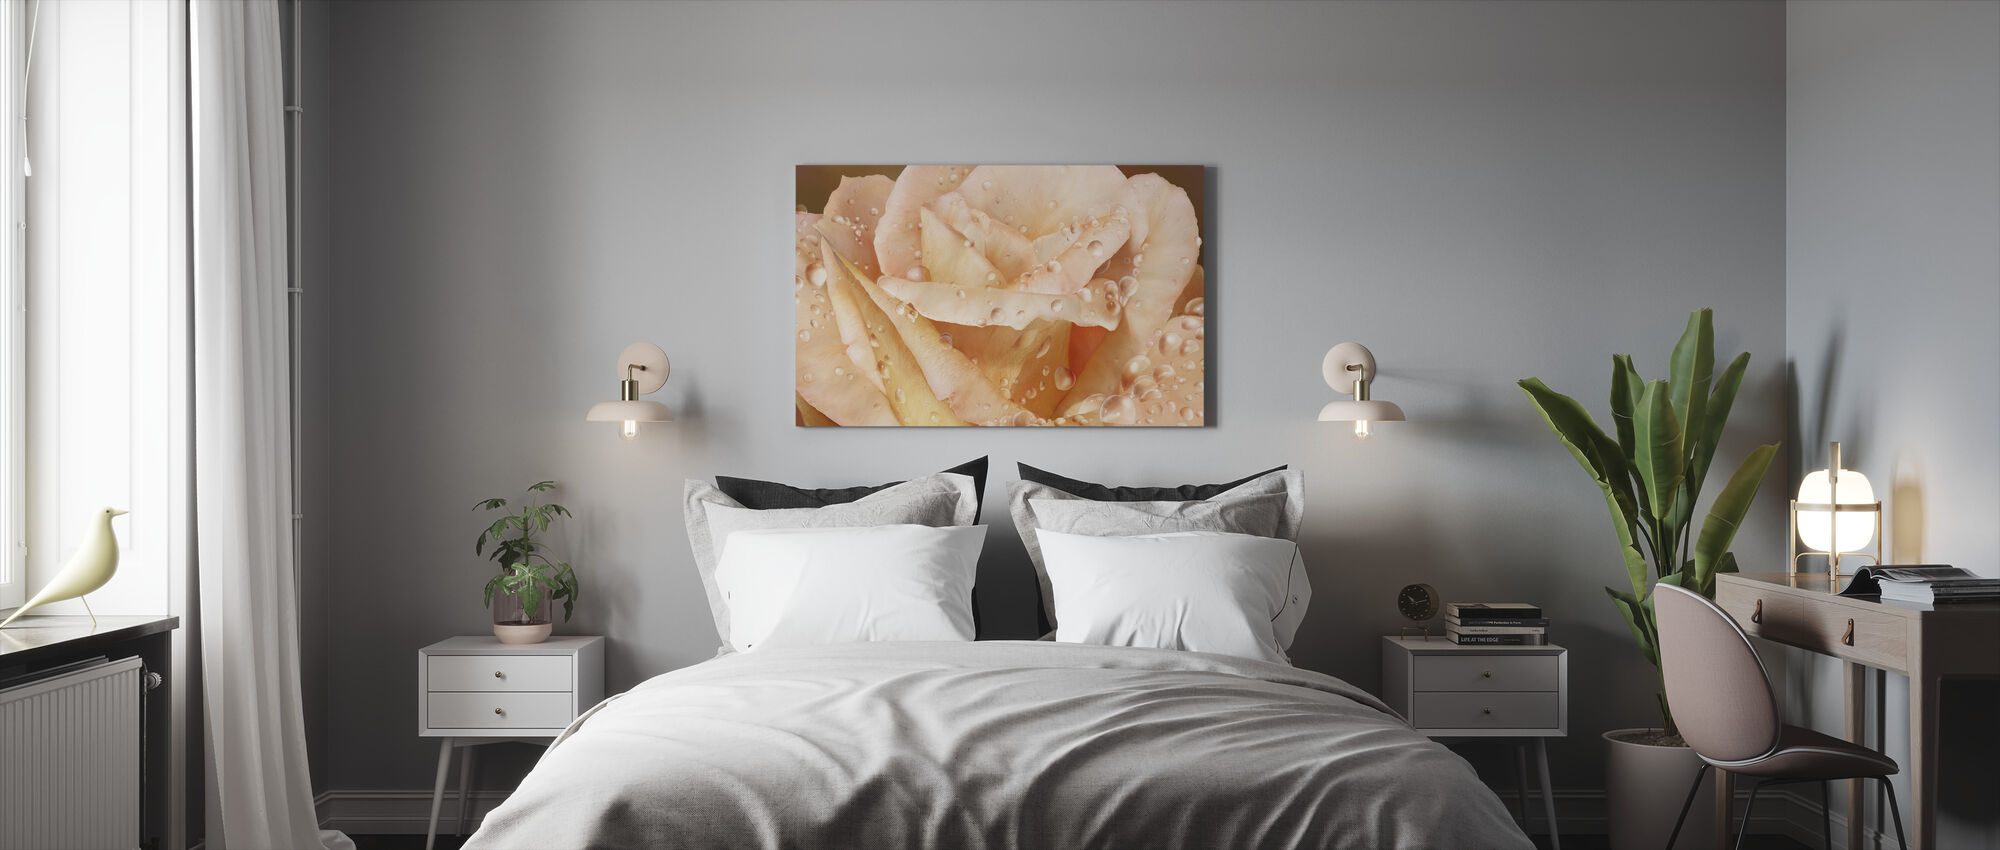 Promised Rose - Canvas print - Bedroom